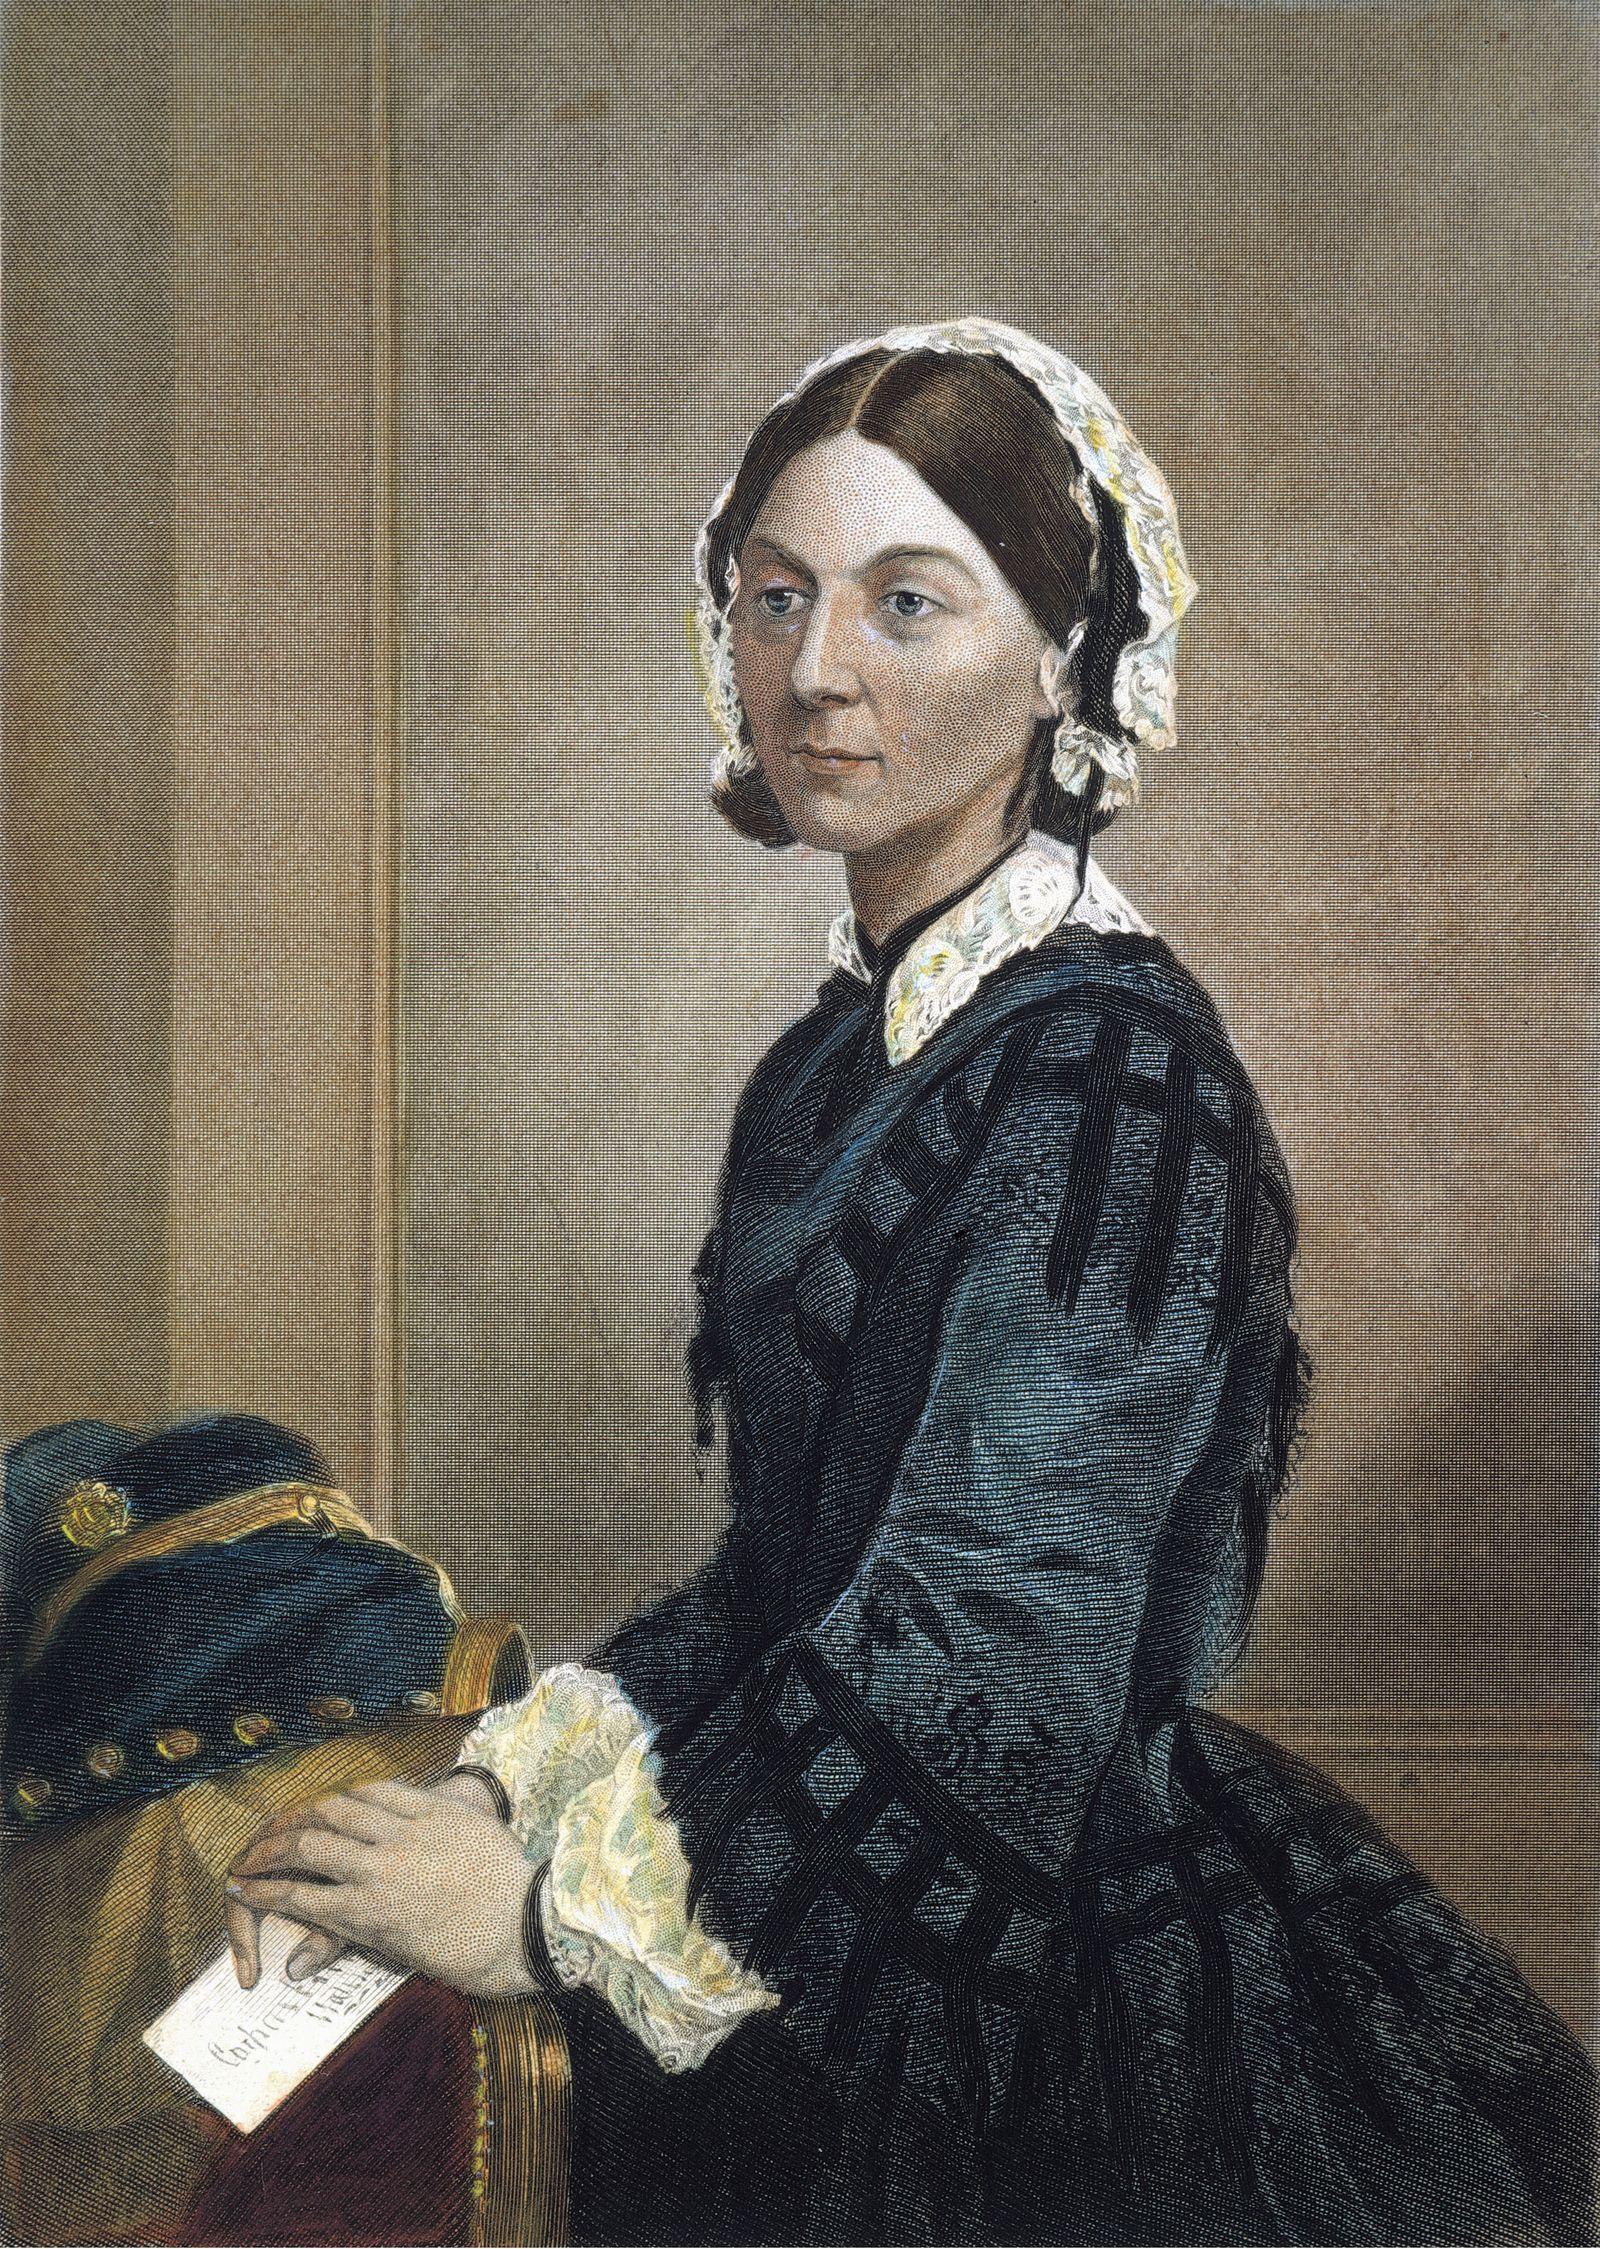 FLORENCE NIGHTINGALE (1820-1910). English nurse, hospital reformer, and philanthropist. Colored engraving, 19th century.